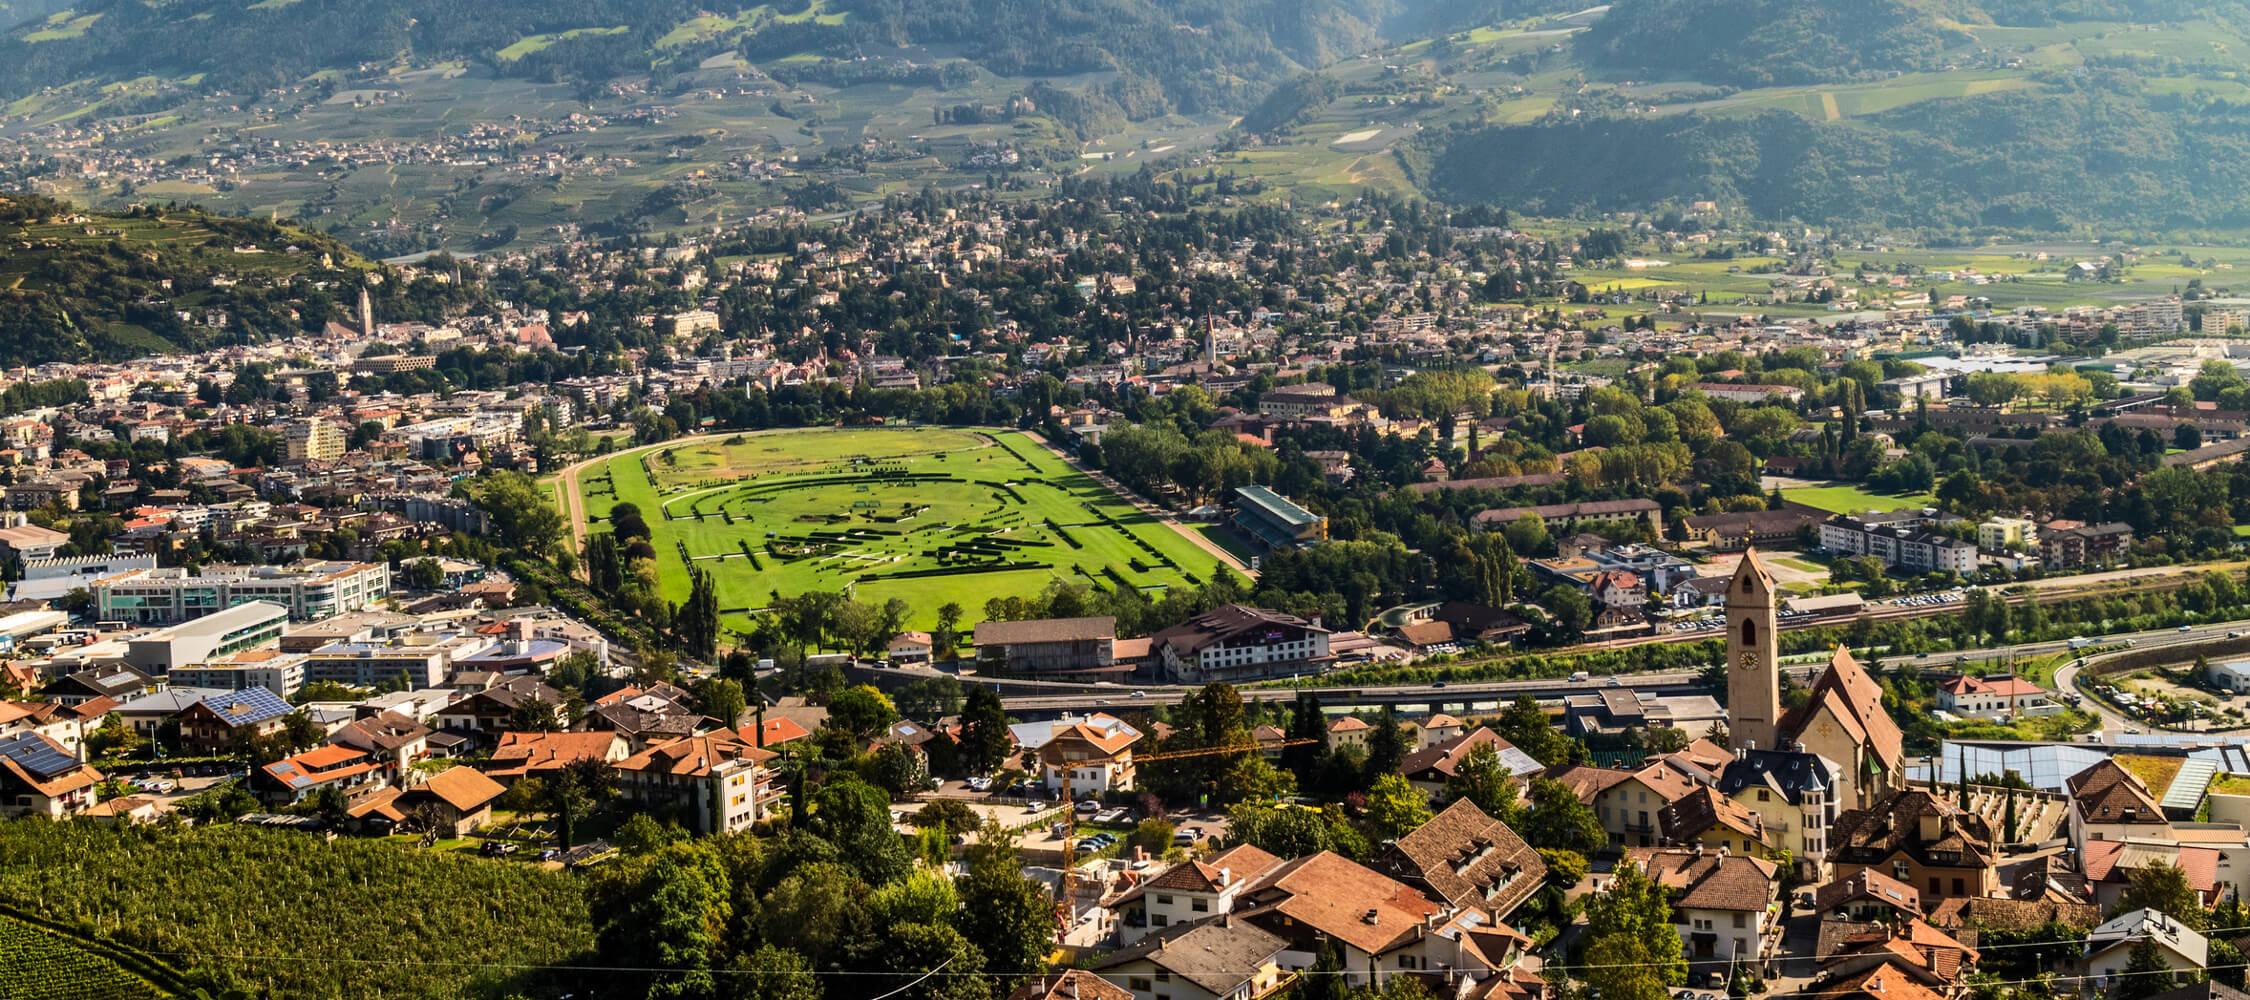 Italien-Trentino_Suedtirol_Alto_Adige_Merano_Meran_Natur_Panorama_Talkessel_Stadt_Pferderennplatz_122567173_2250x1000